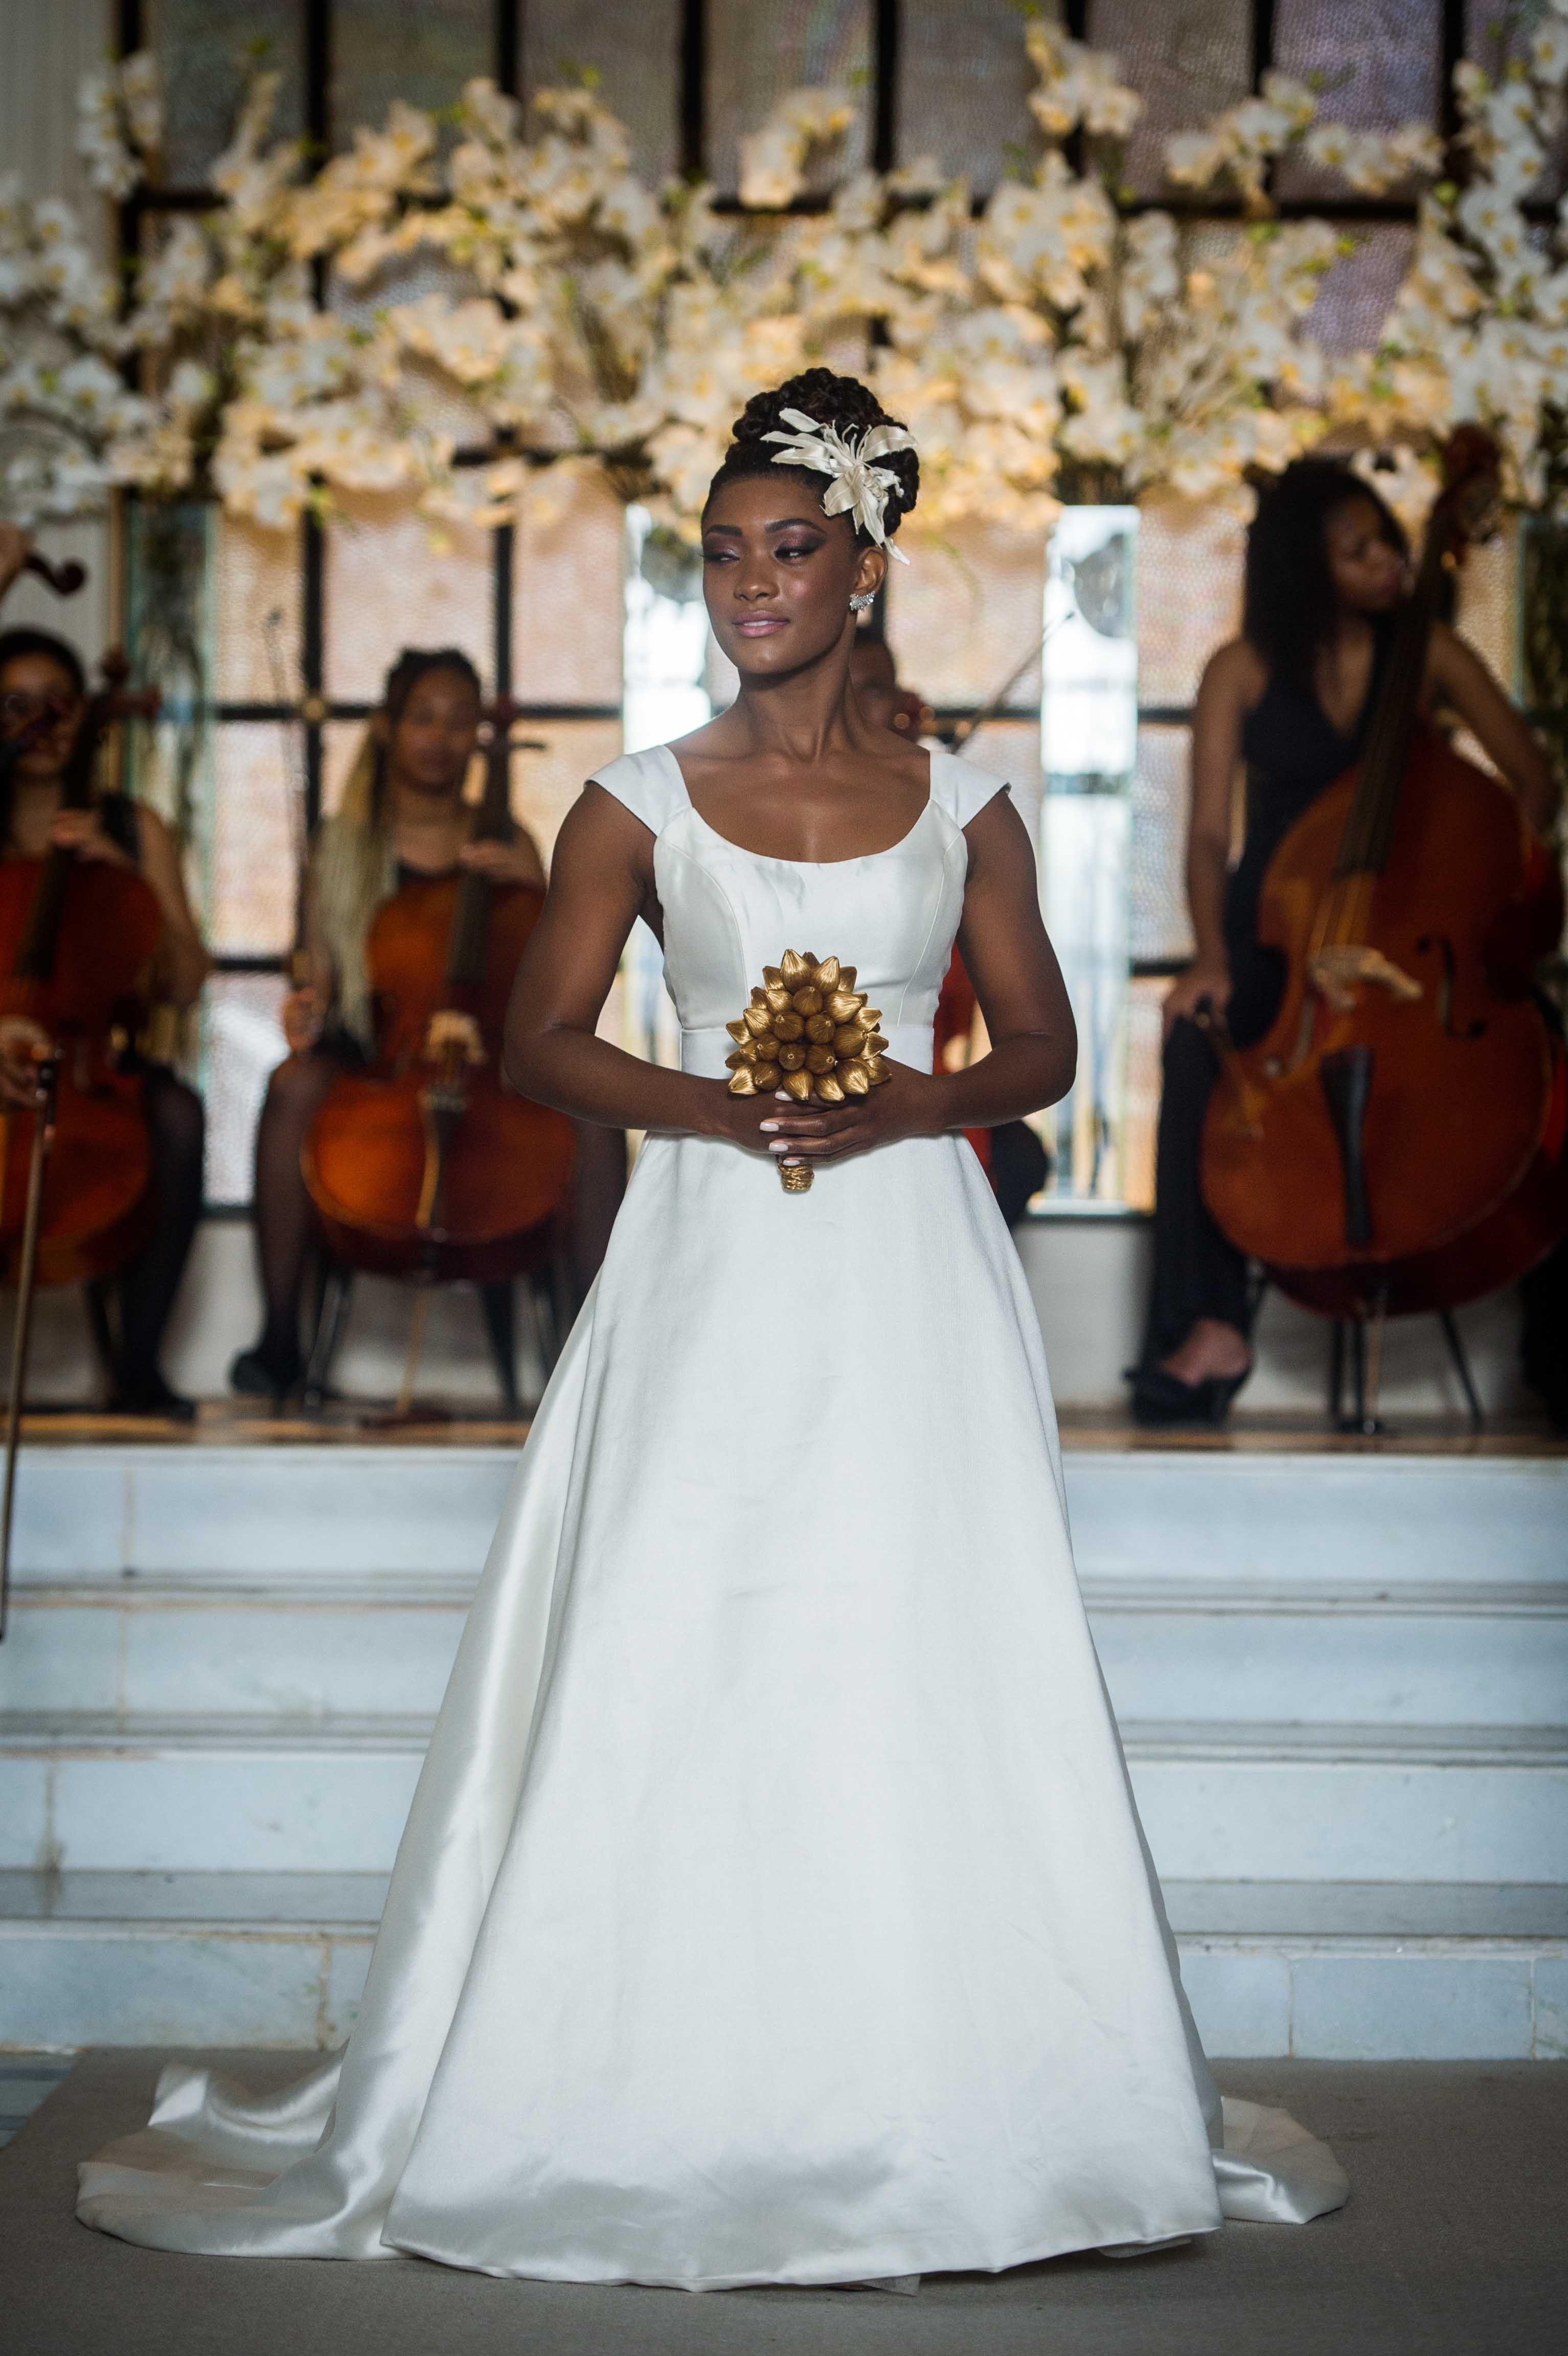 Vestido de noiva da Raquel (Erika Januza)  OOutroLadoDoParaíso 246377b9bb41